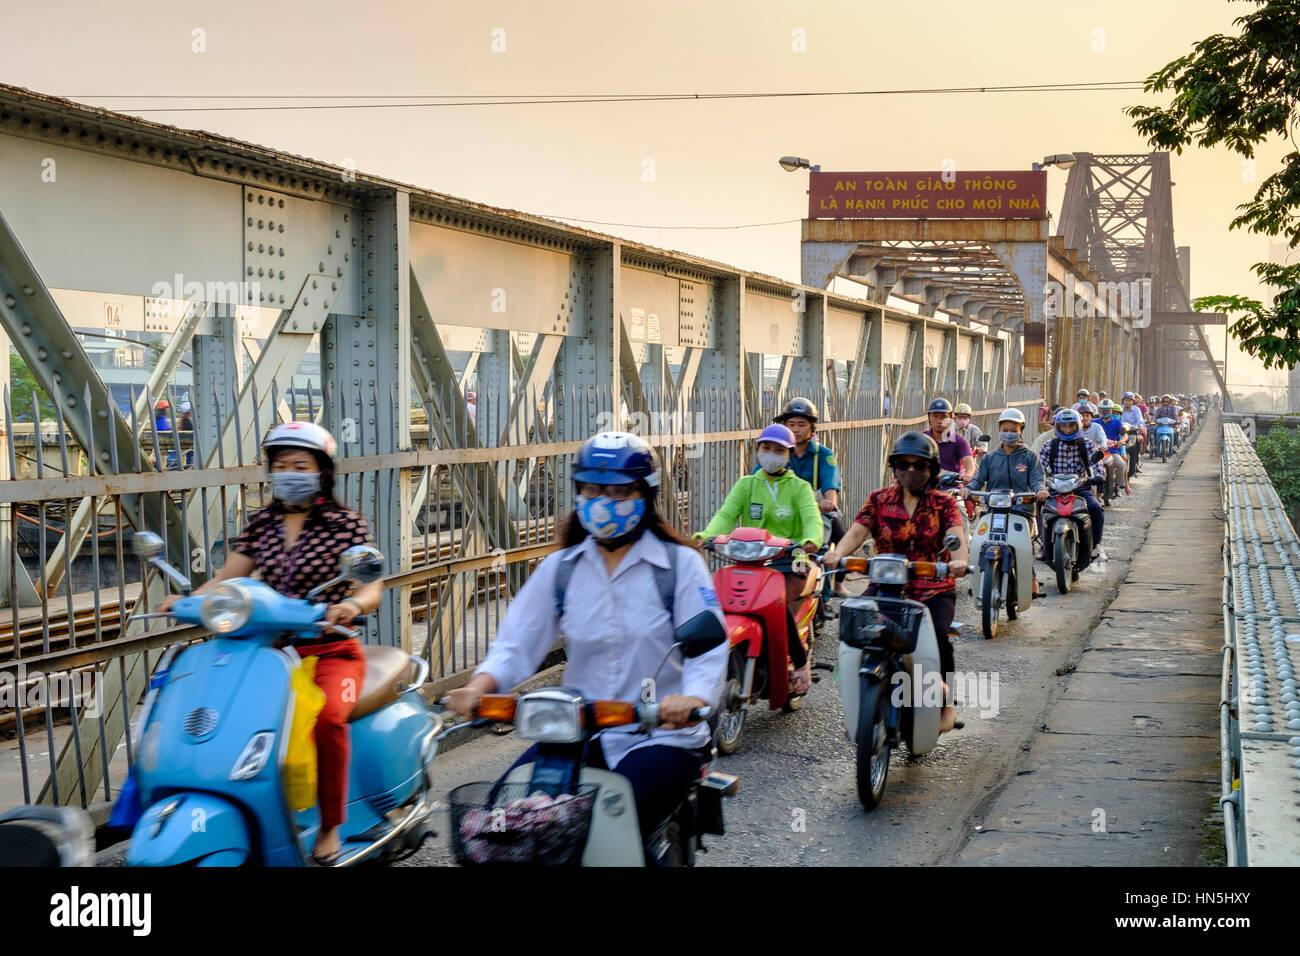 Heavy commuter traffic on the Long Bien cantilever bridge, Hanoi, Vietnam - Stock Image